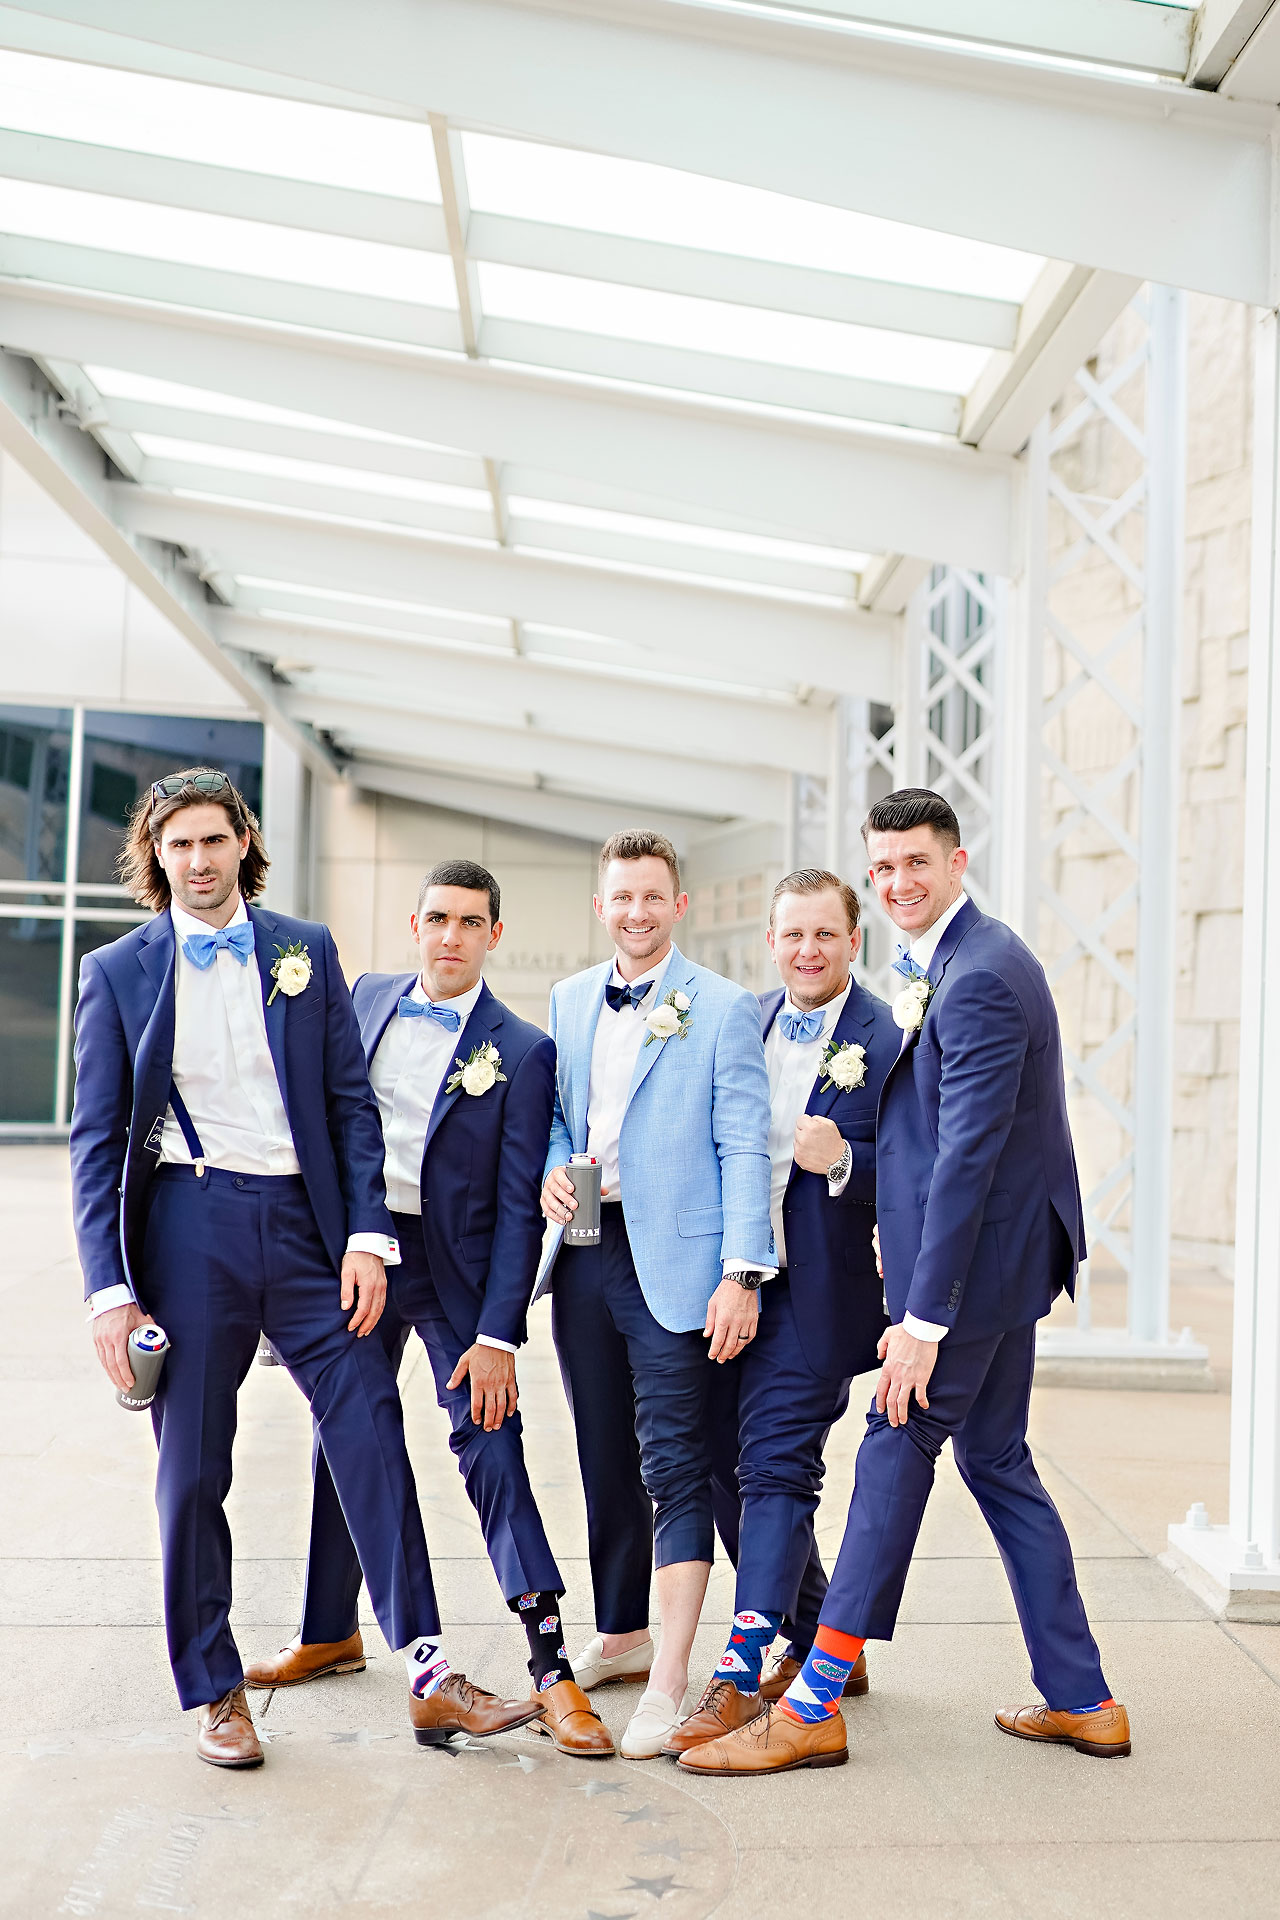 Sammi Jack Regions Tower JPS Events Indianapolis Wedding 169